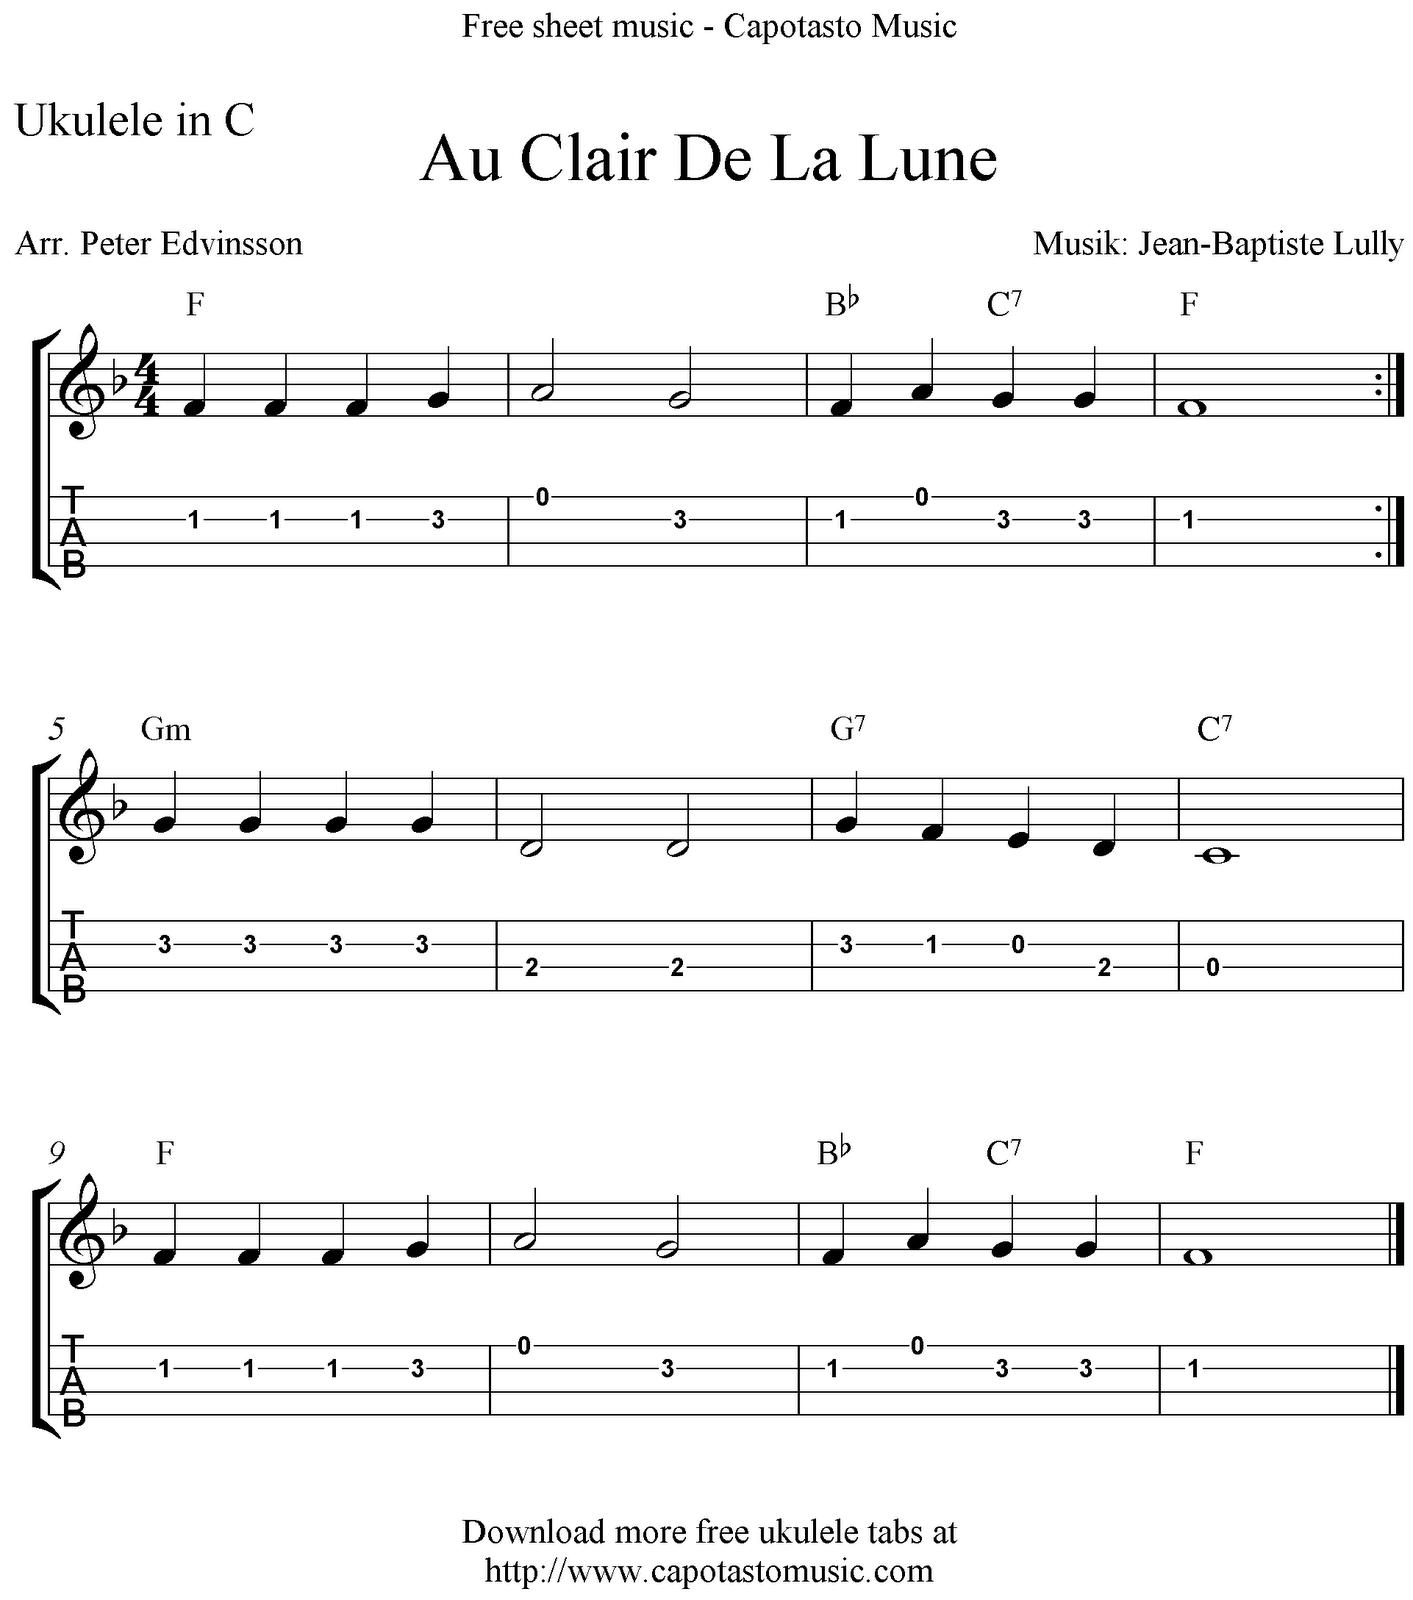 Au clair de la lune ukulele sheet music free printable au clair de la lune ukulele sheet music free printable hexwebz Image collections